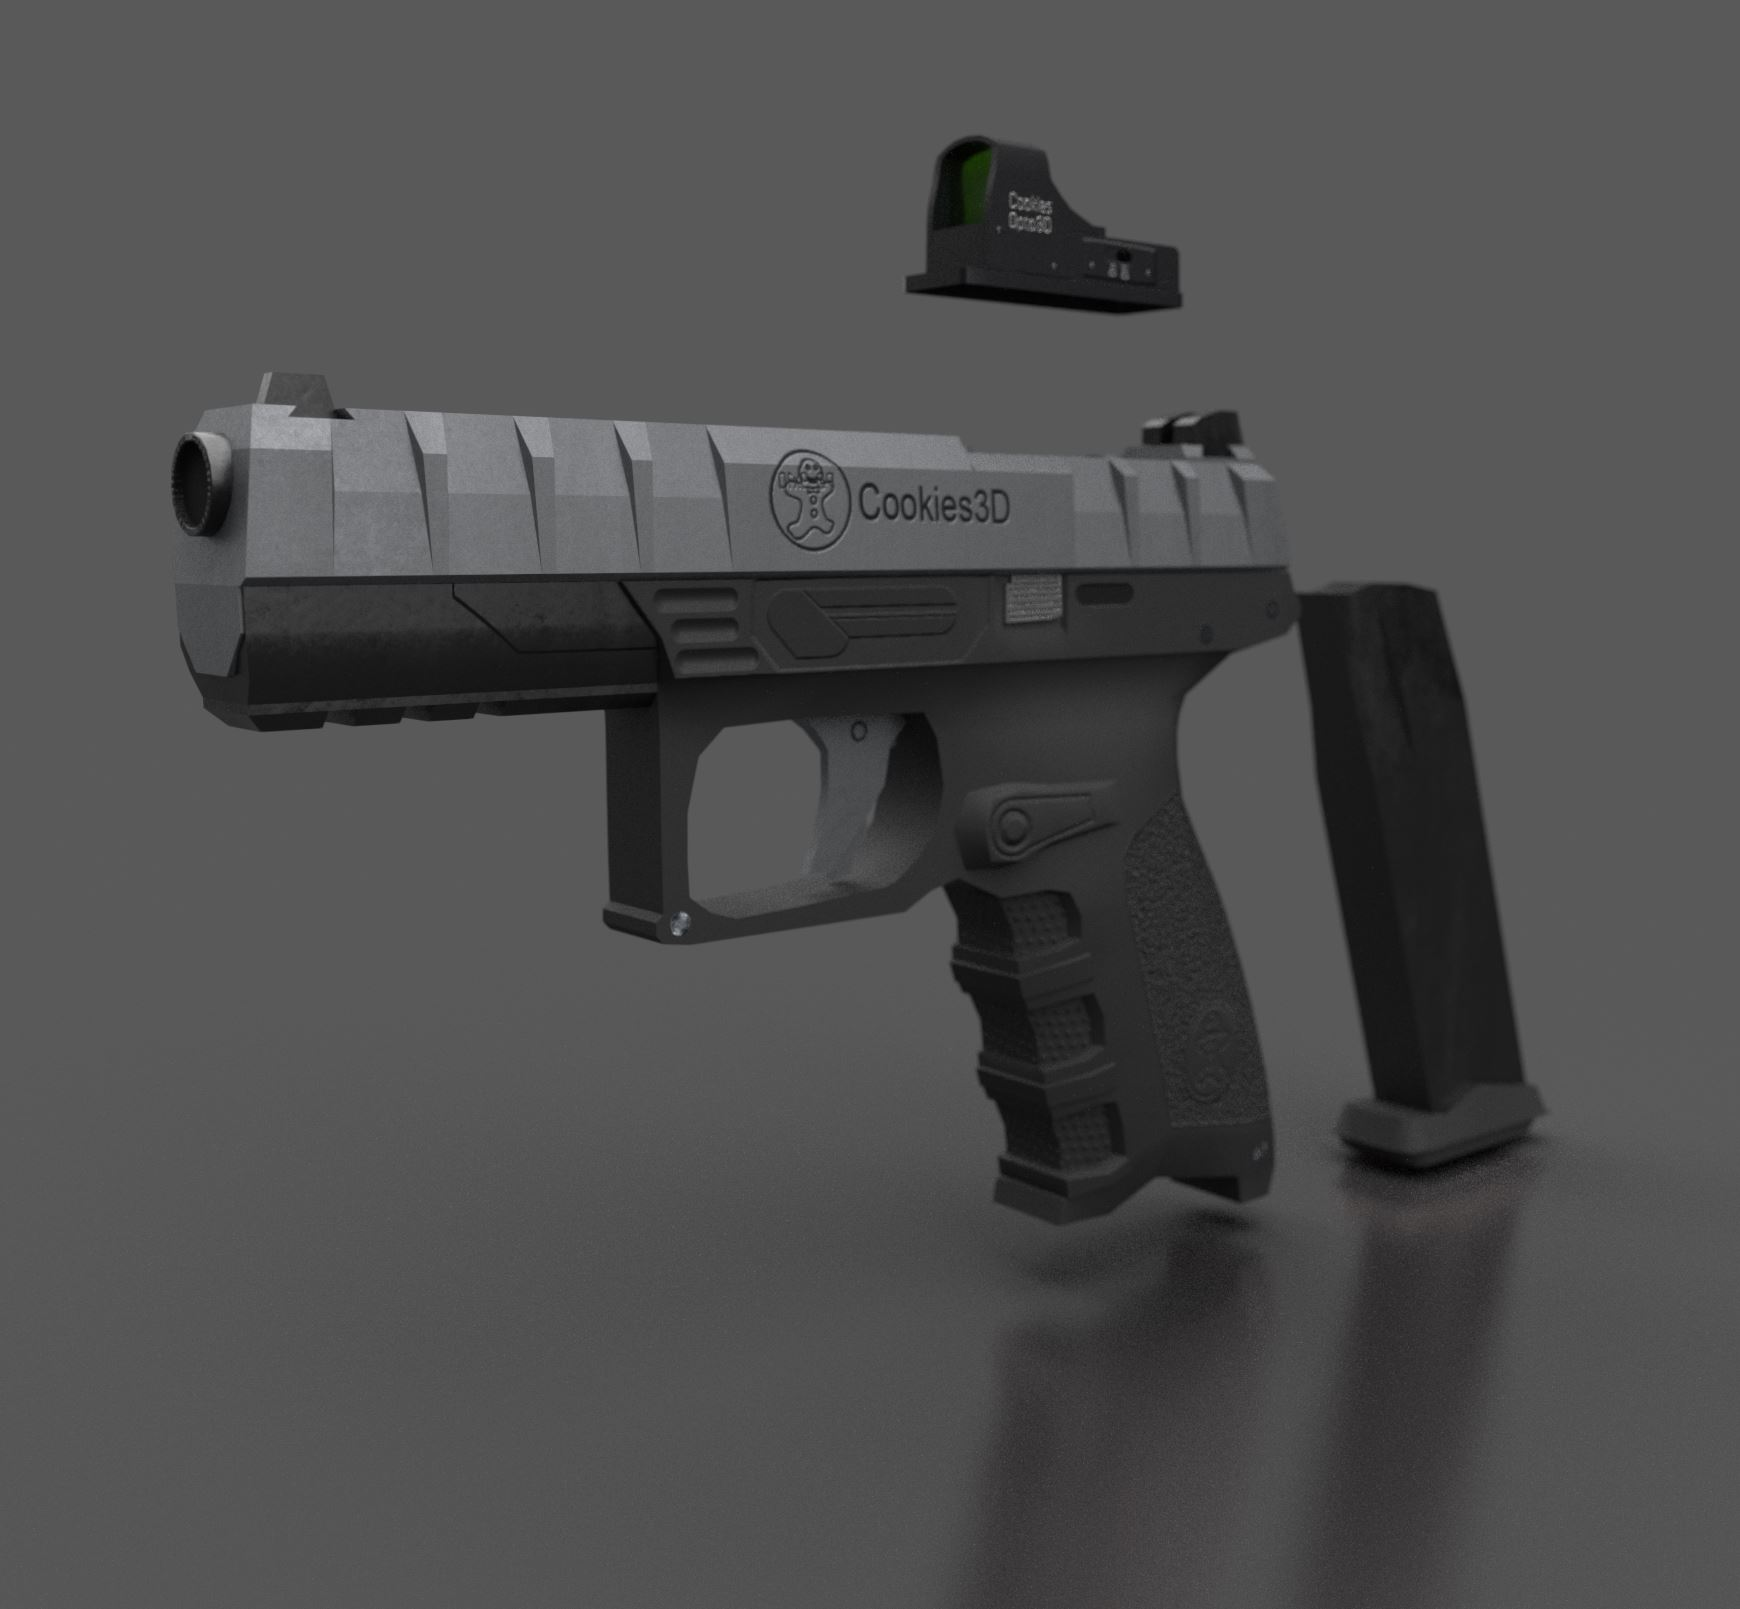 Cookies3D (Beretta) APX